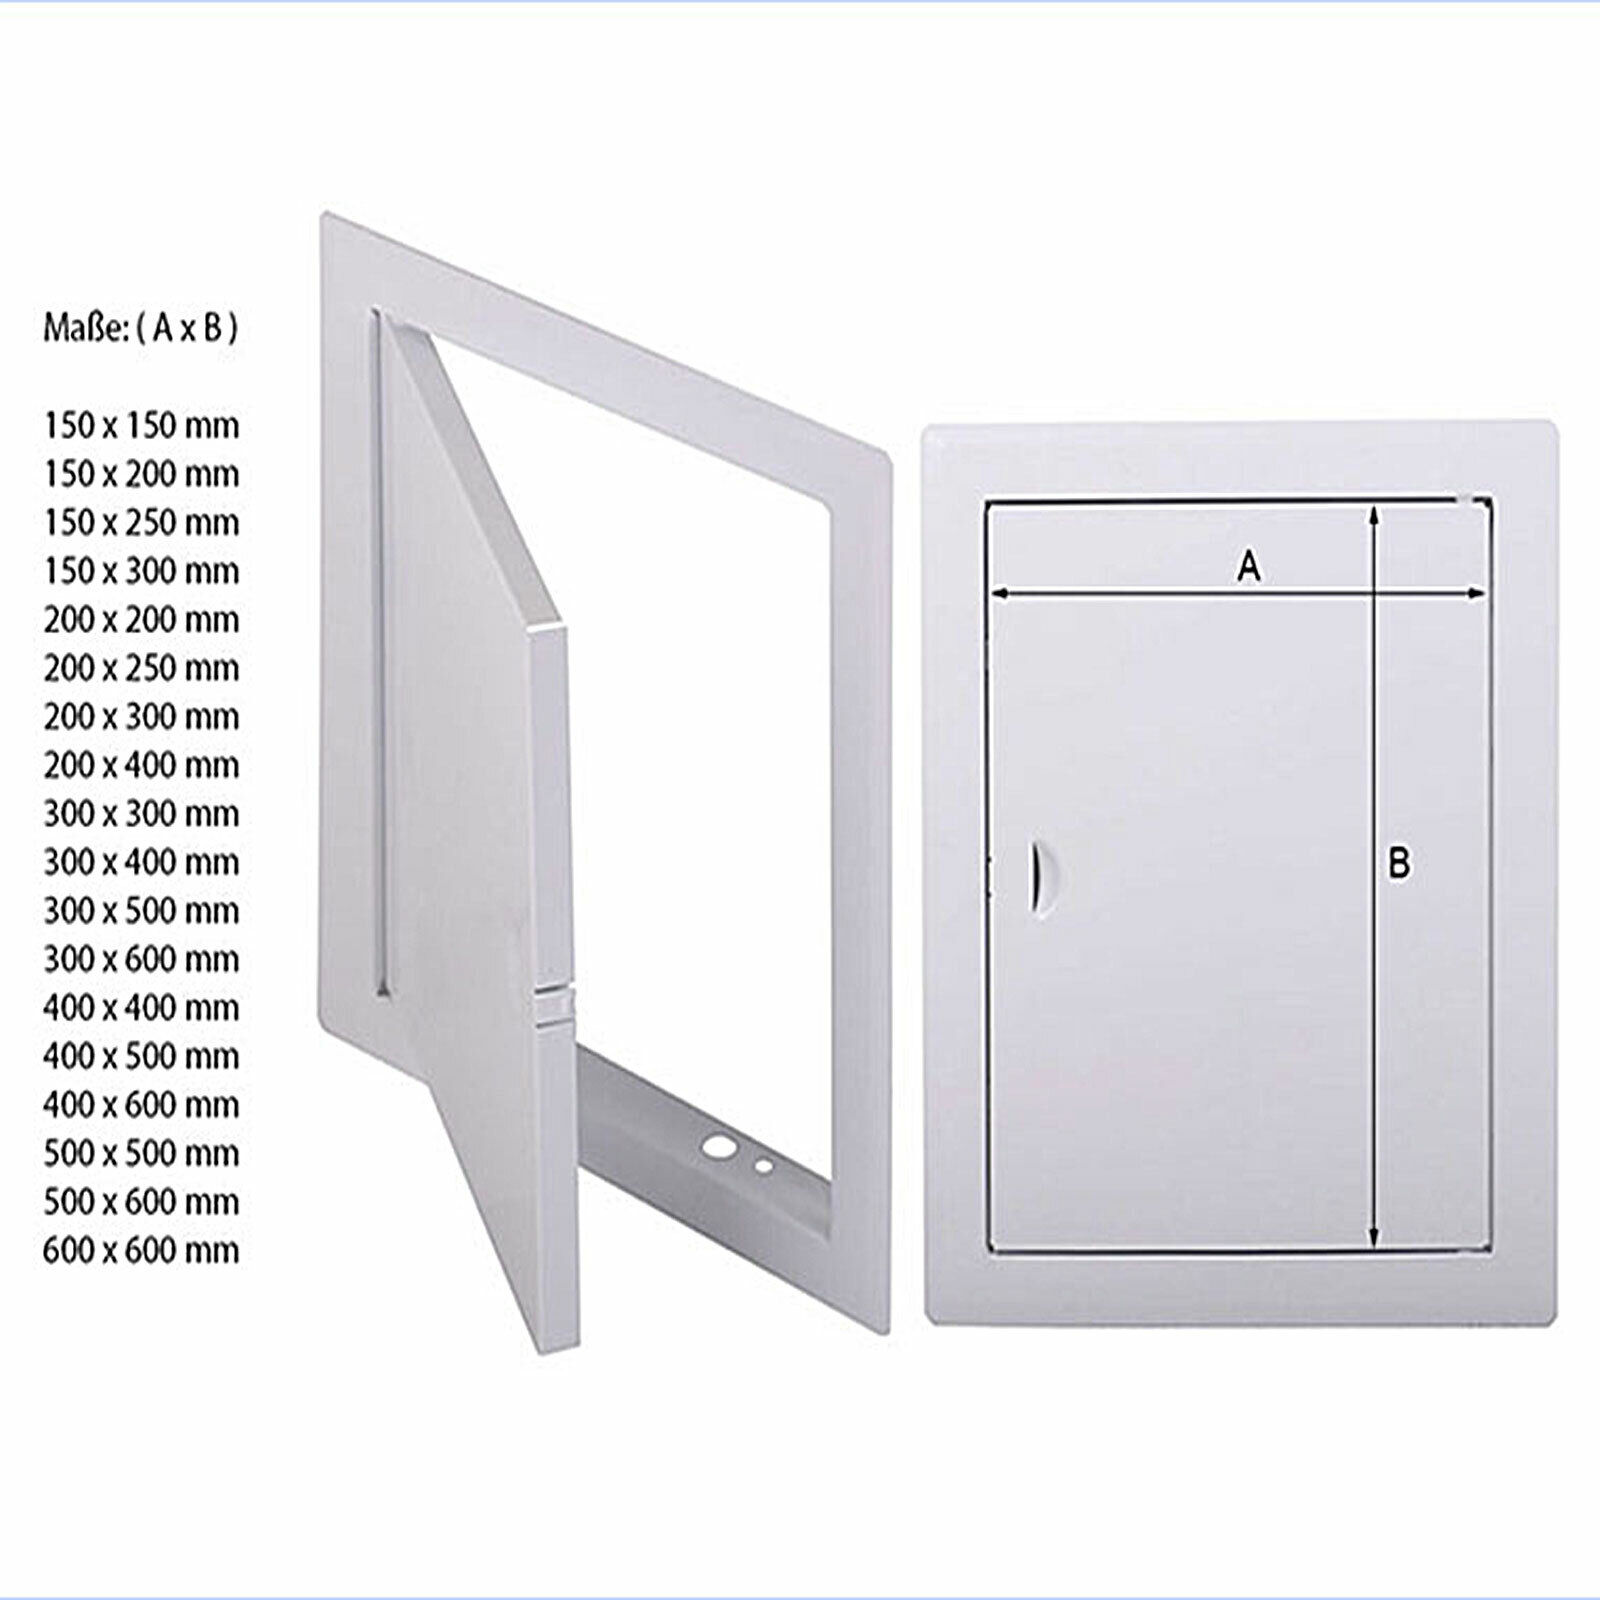 Revisionsklappe 50x50 cm Stahl weiß Revisionstür Reviklappe 500x500 mm